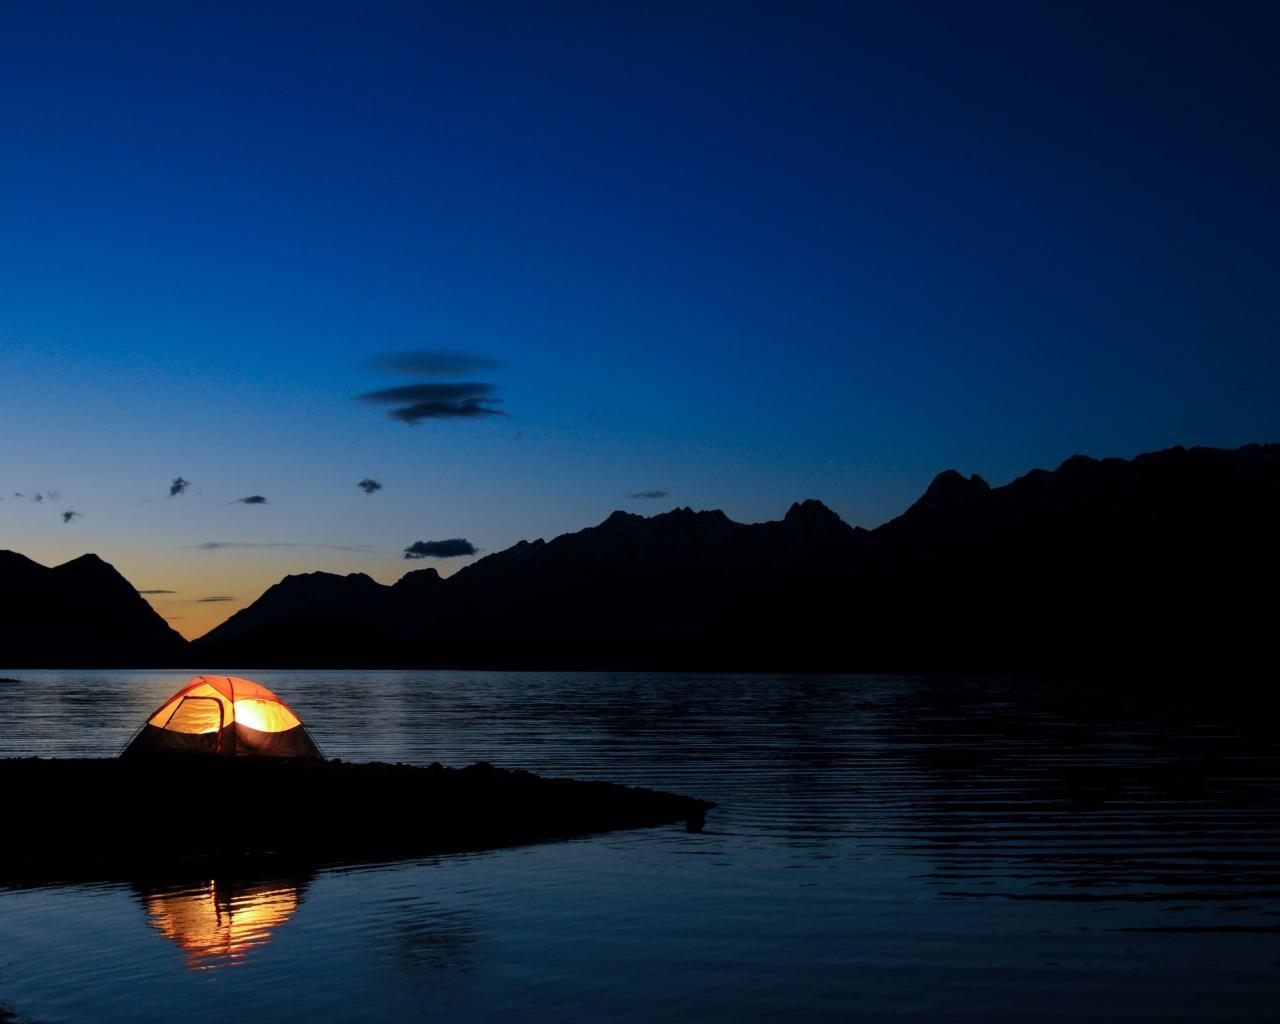 Camping wallpaper 1280x1024